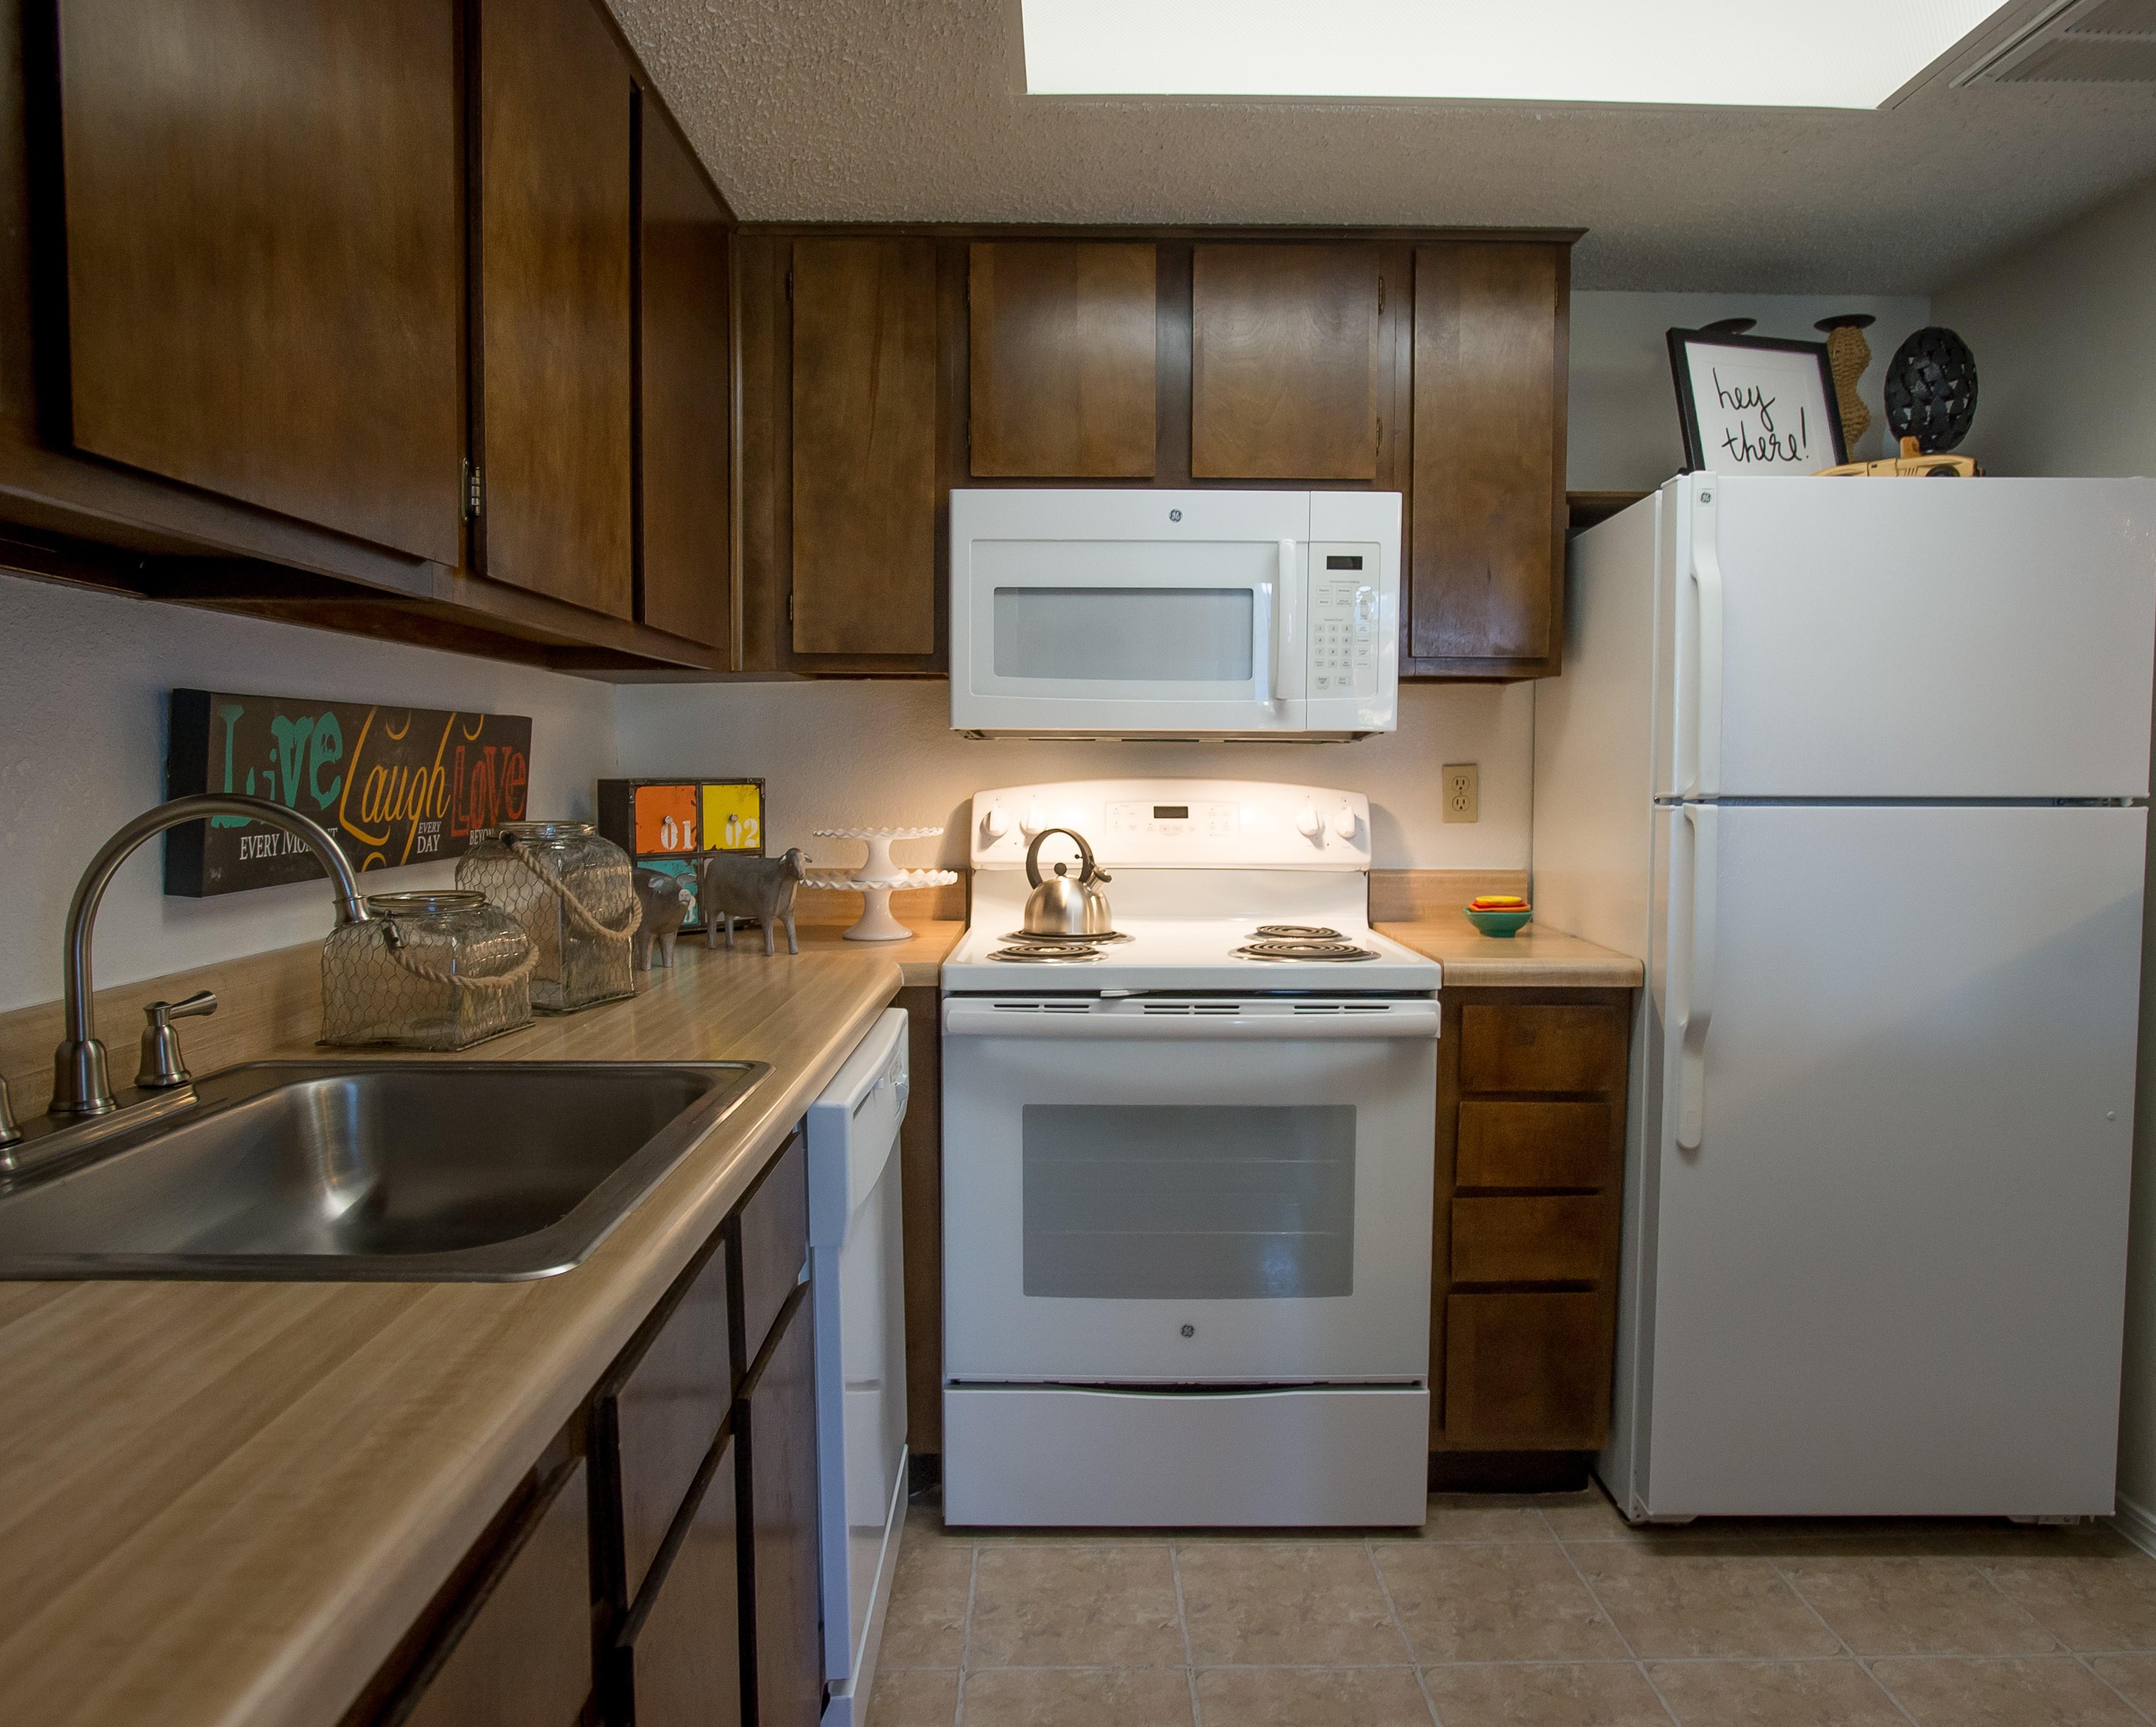 Apartments Near OC Hunters Ridge Apts. for Oklahoma Christian University Students in Edmond, OK